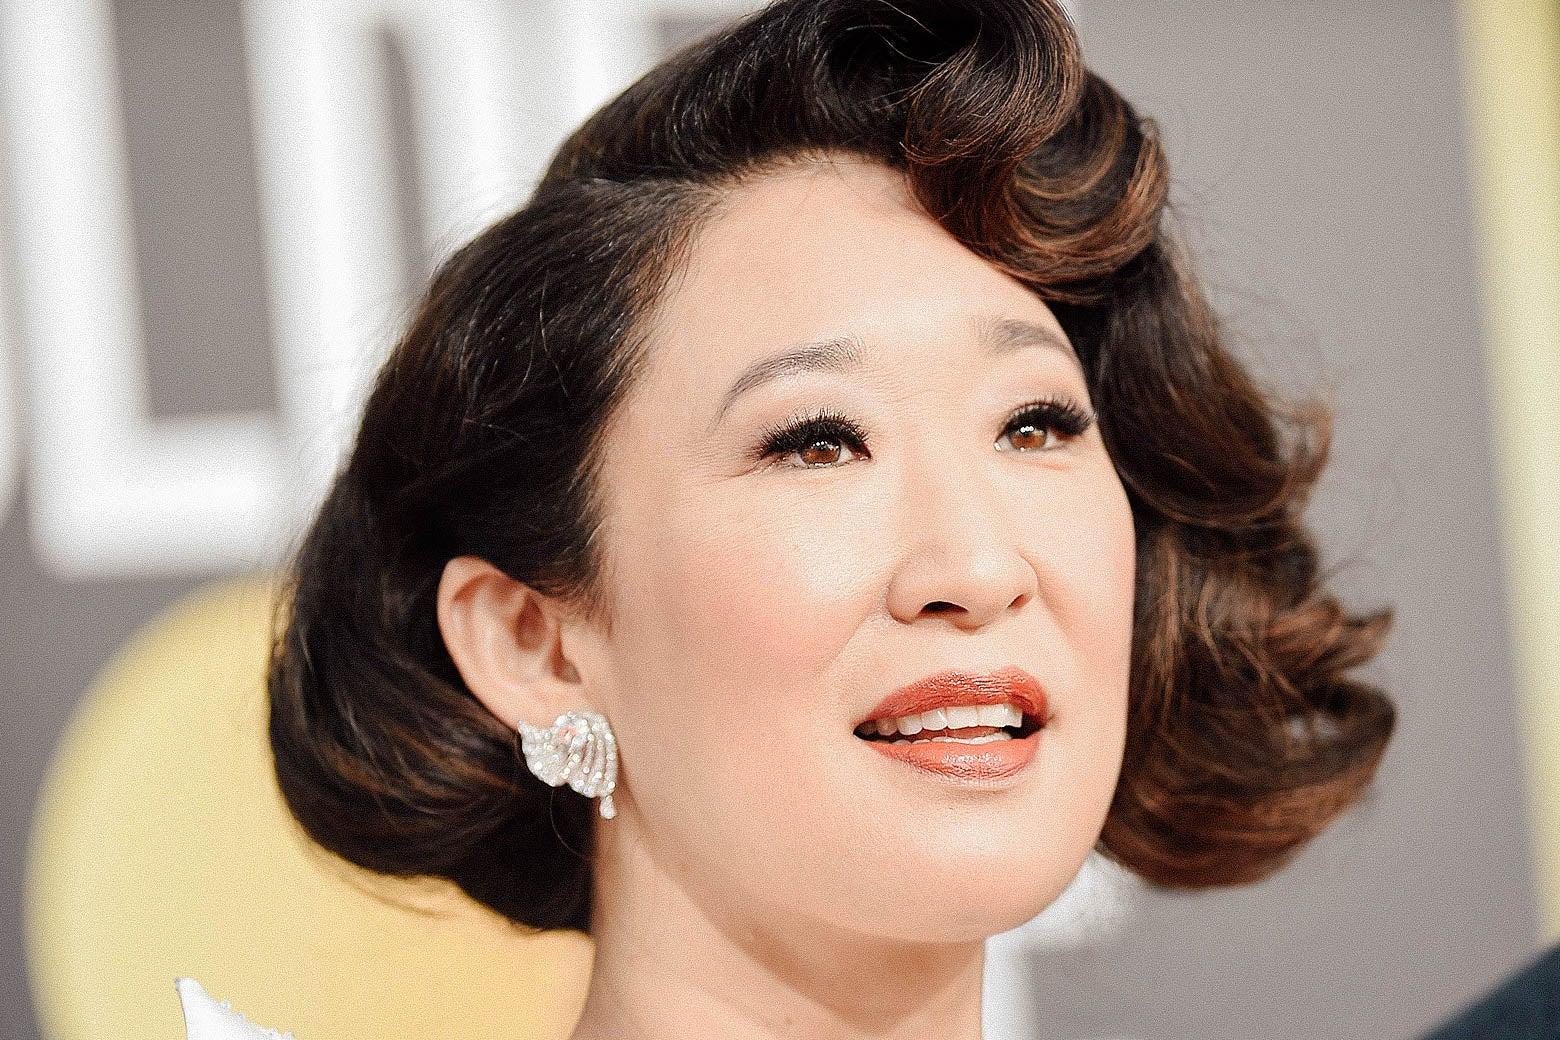 Sandra Oh arrives for the 2019 Golden Globes.